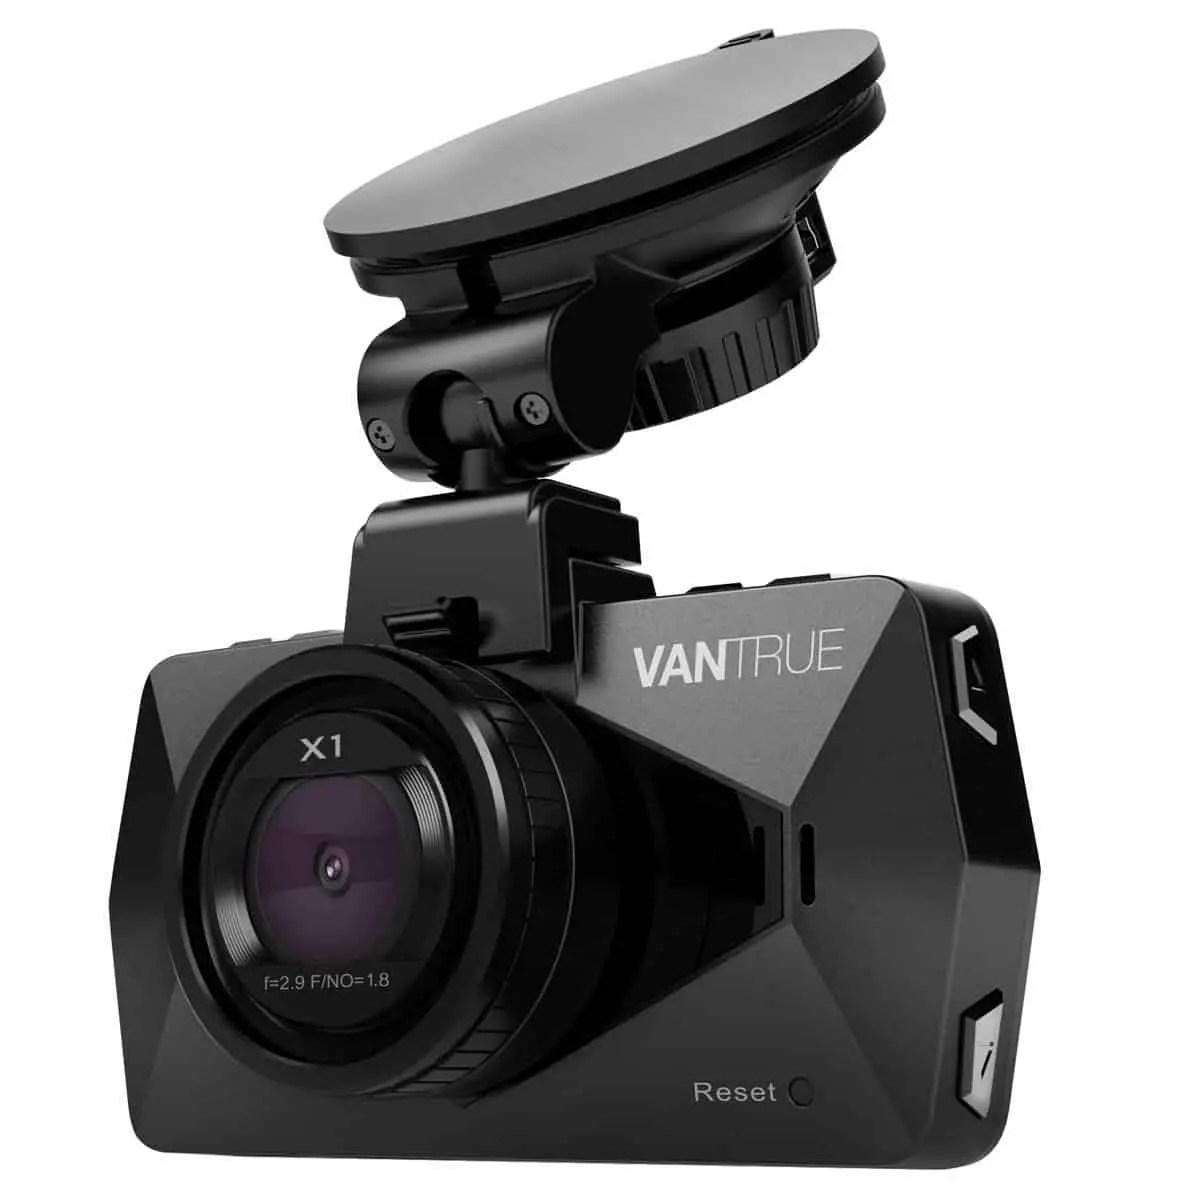 Vantrue X1 Dash Camera